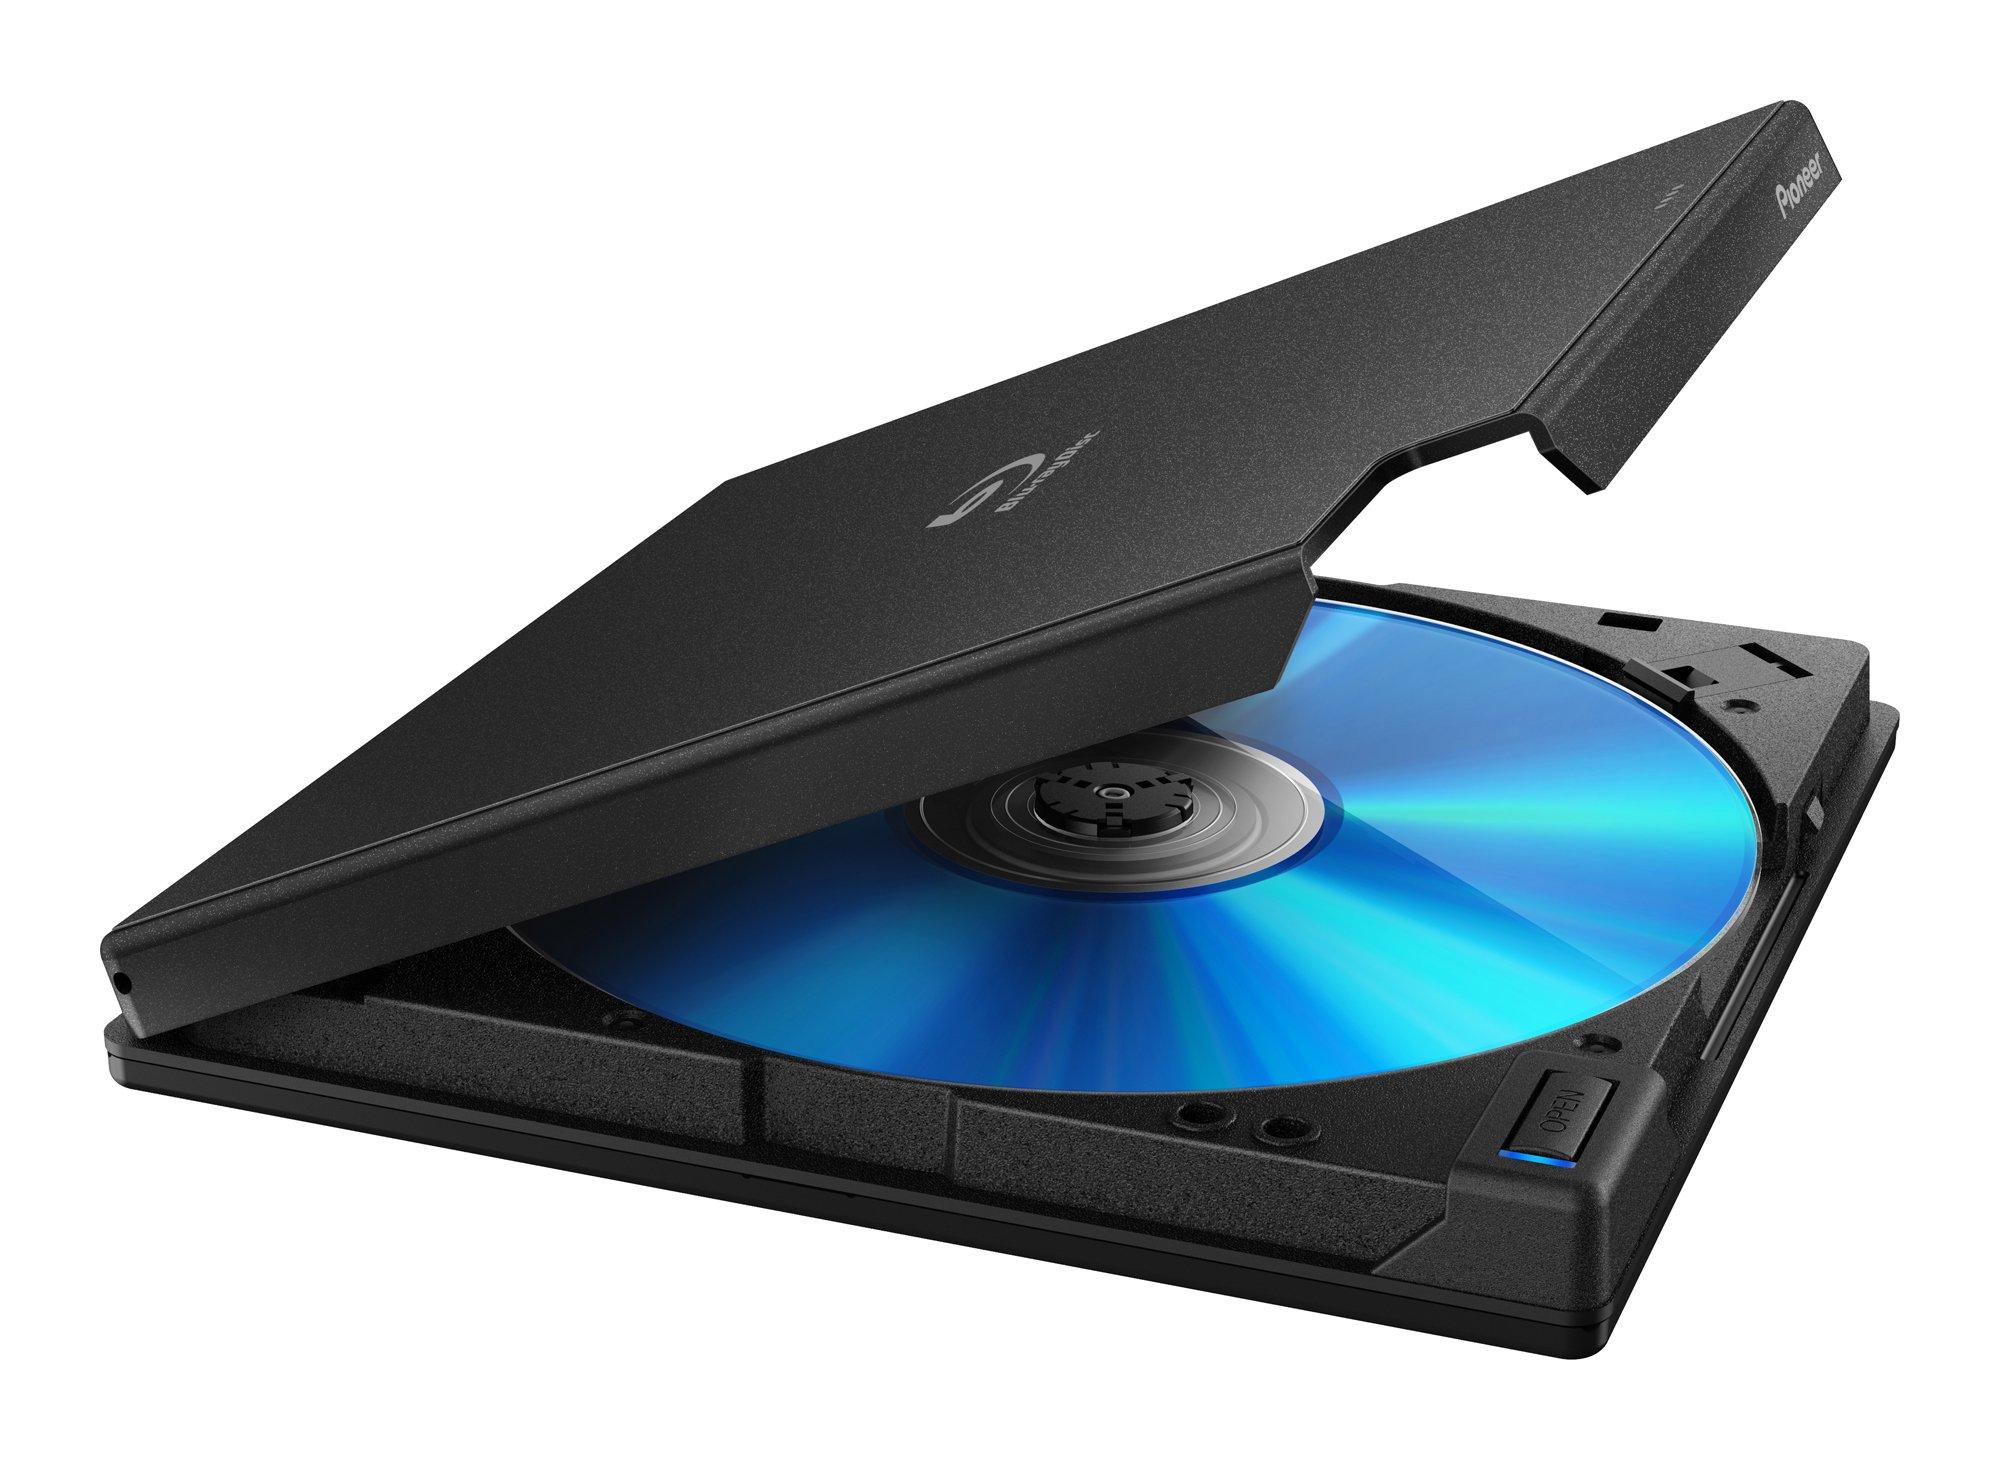 BDR-XD06J-UHD Pioneer Ultra HD Blu-ray Portable USB 4K Bluray Drive Supports BDXL/BD/DVD/CD by Pioneer Japan (Image #4)